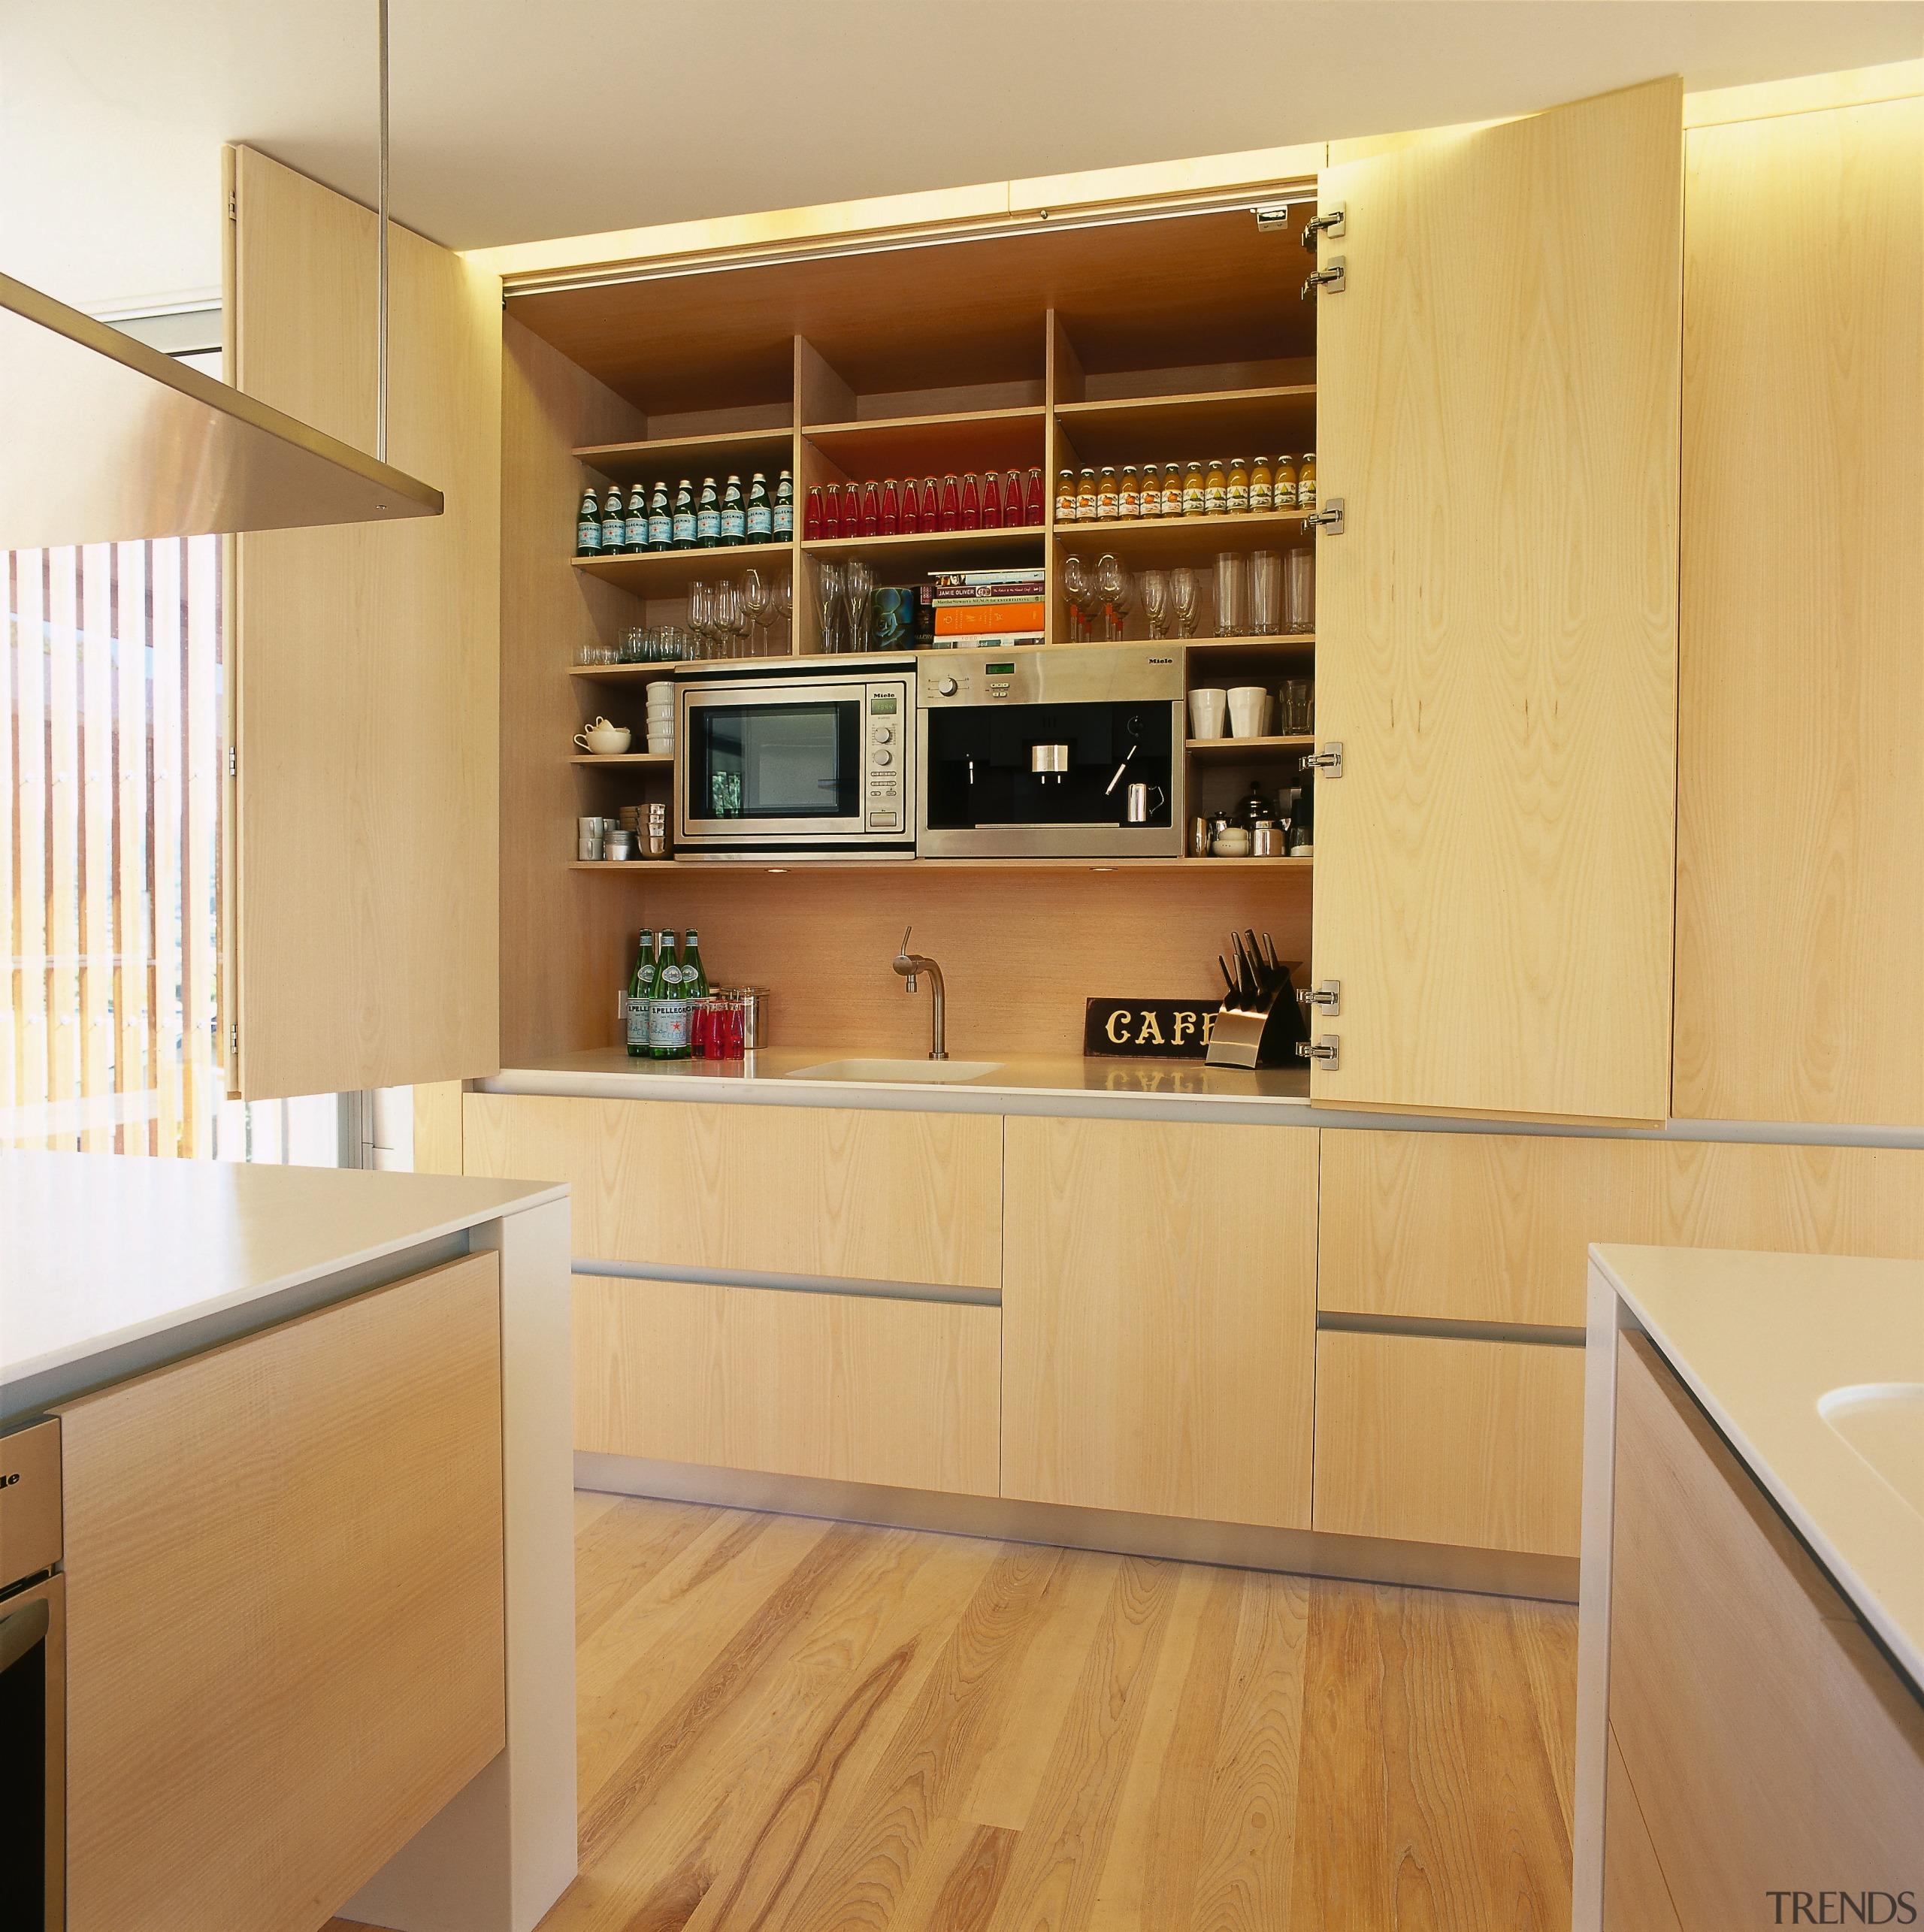 A view of a kitchen area, wooden flooring cabinetry, countertop, cuisine classique, floor, flooring, furniture, hardwood, interior design, kitchen, plywood, shelf, shelving, wood, wood flooring, orange